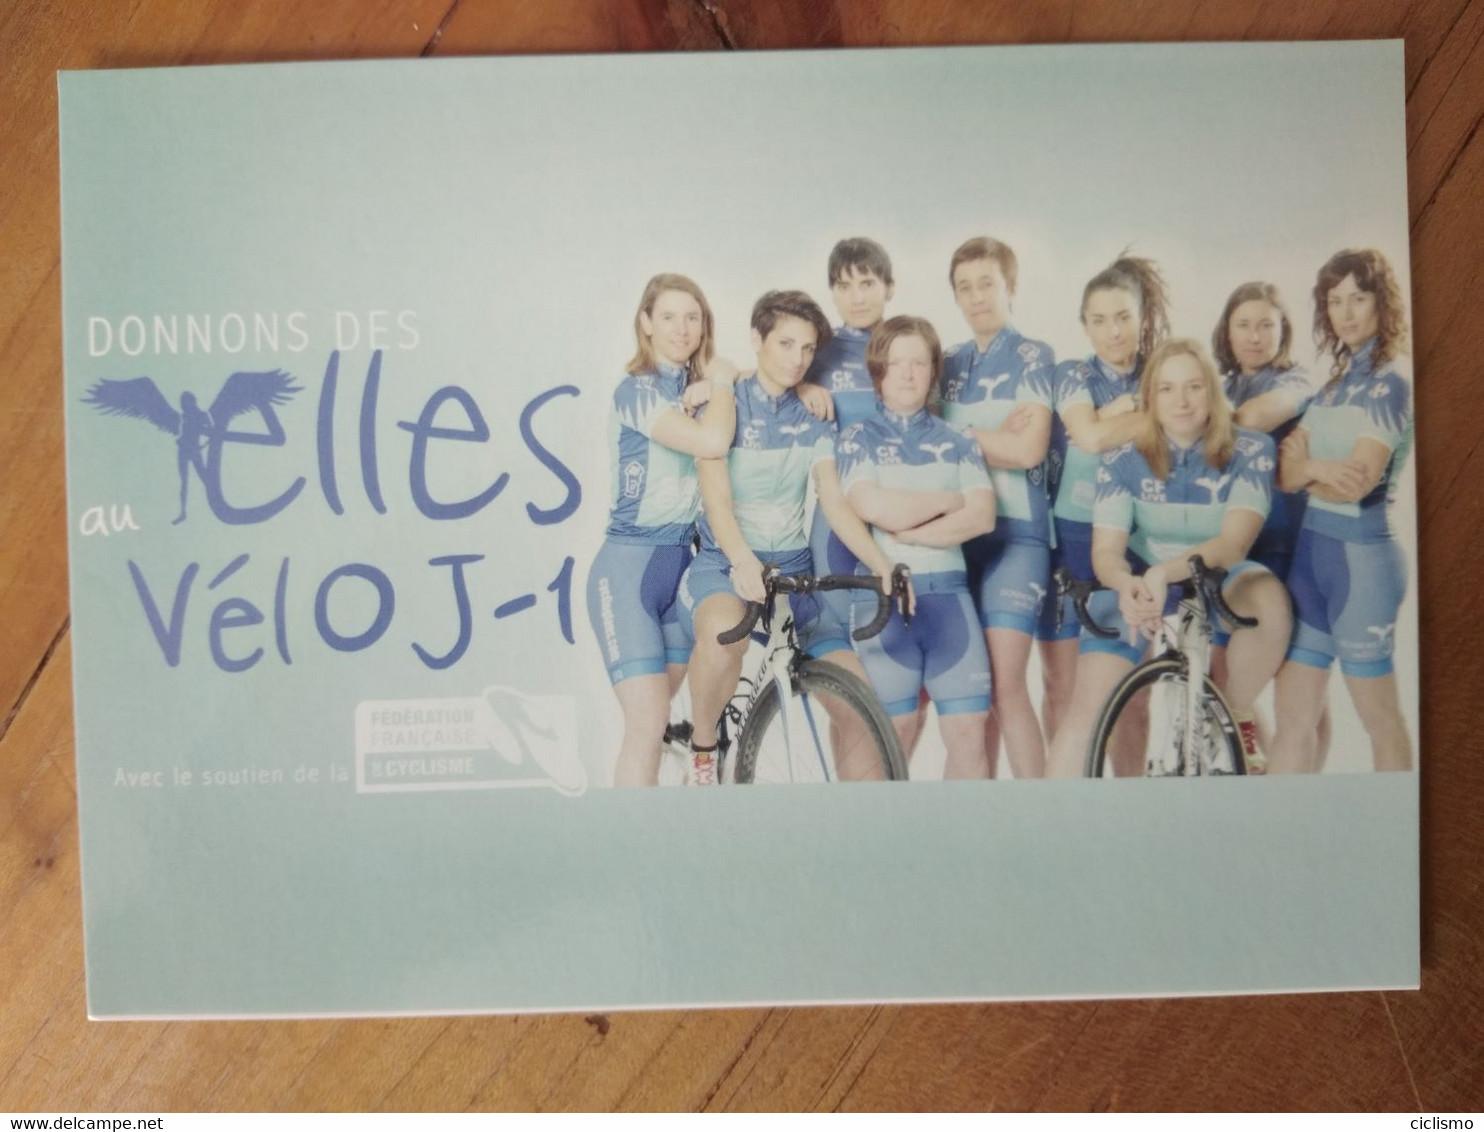 Cyclisme - Carte Publicitaire Fédération Française De Cyclisme : ELLES VELOJ_1 - Cycling